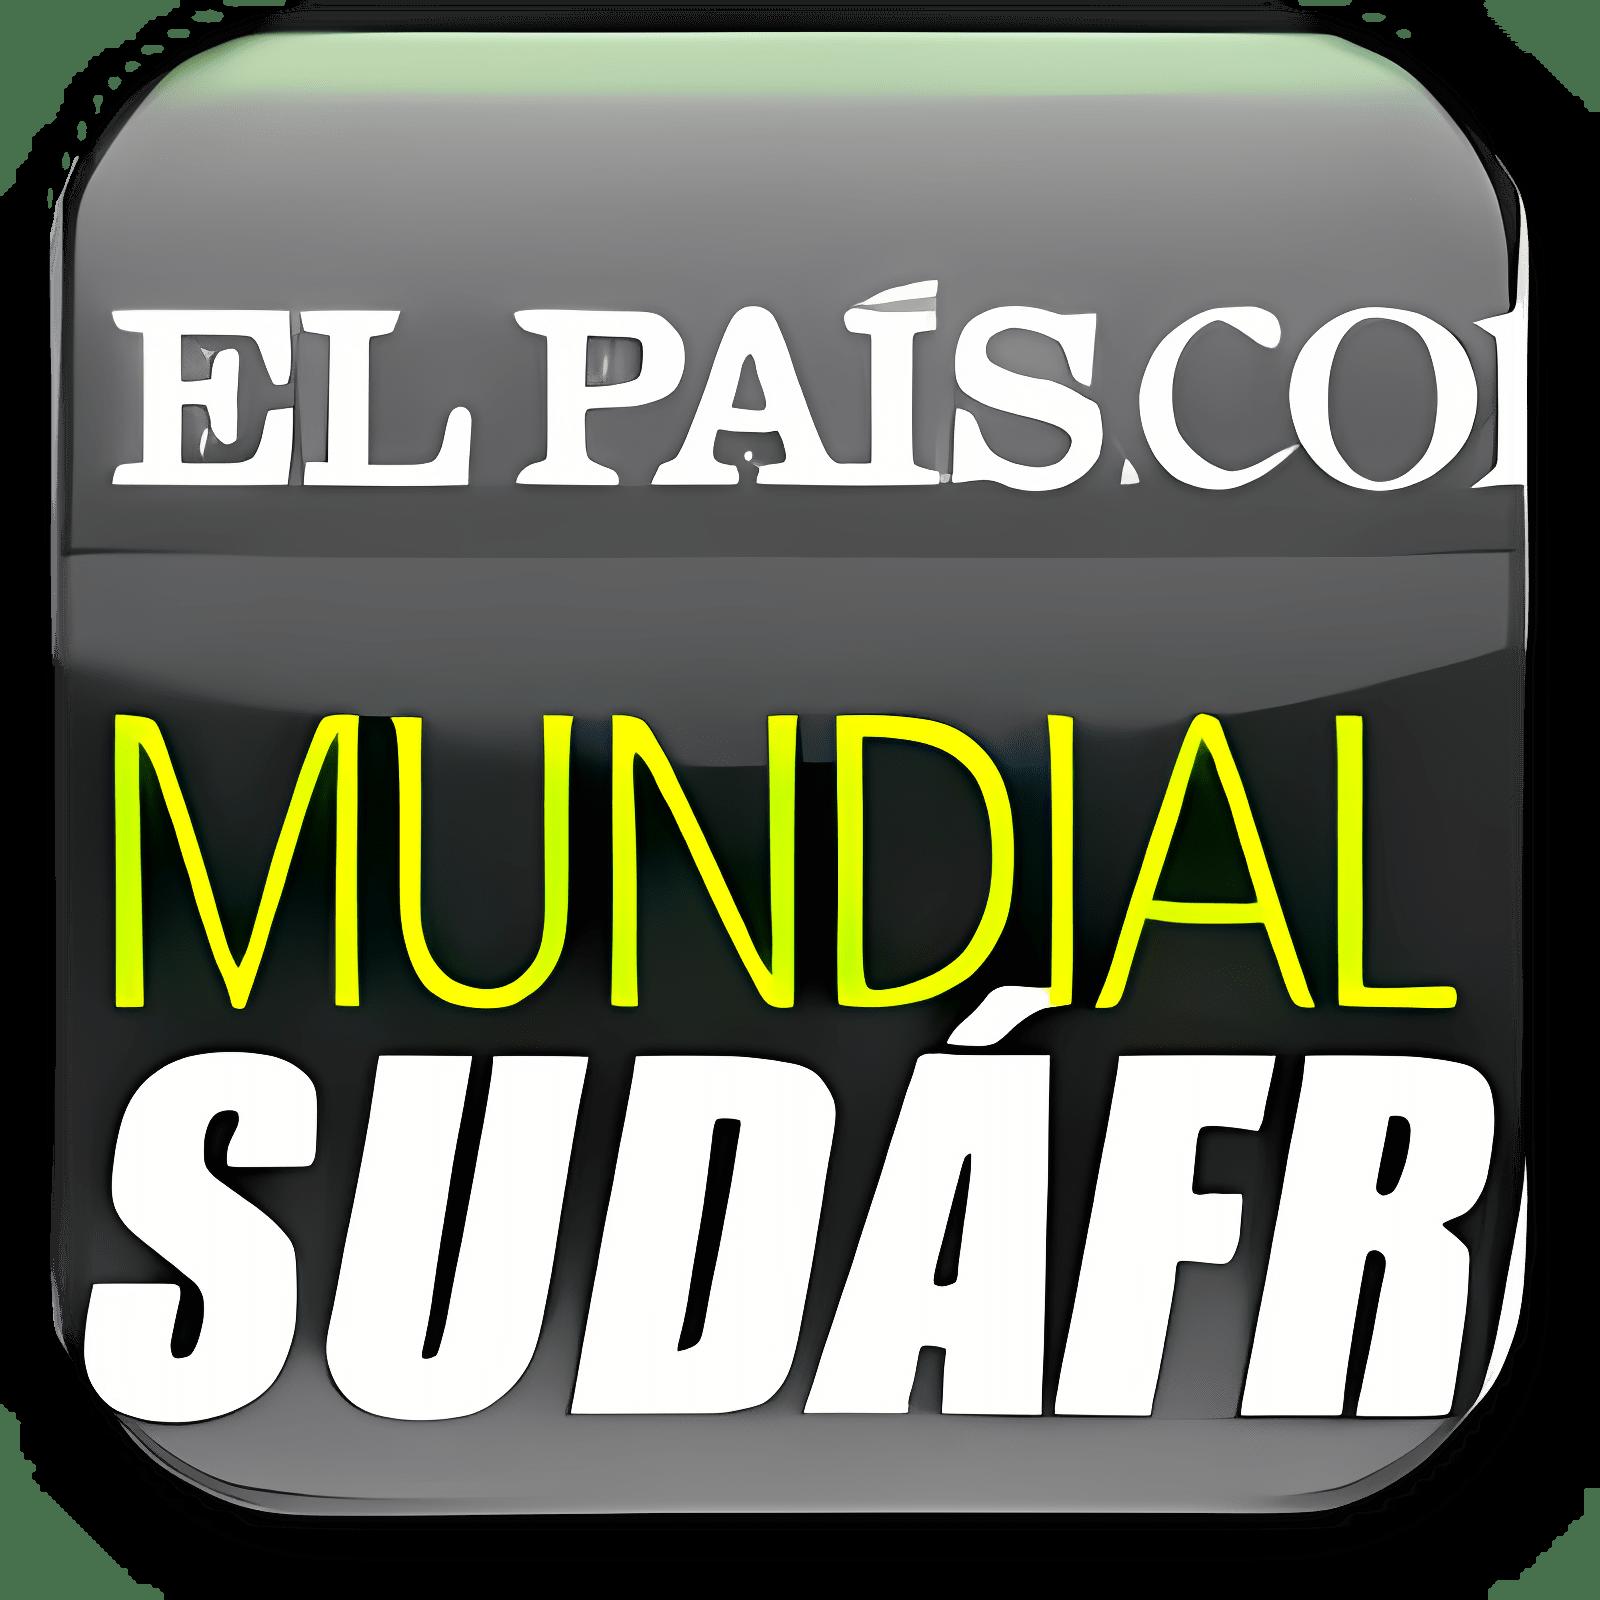 El País.com Widget Mundial 2010